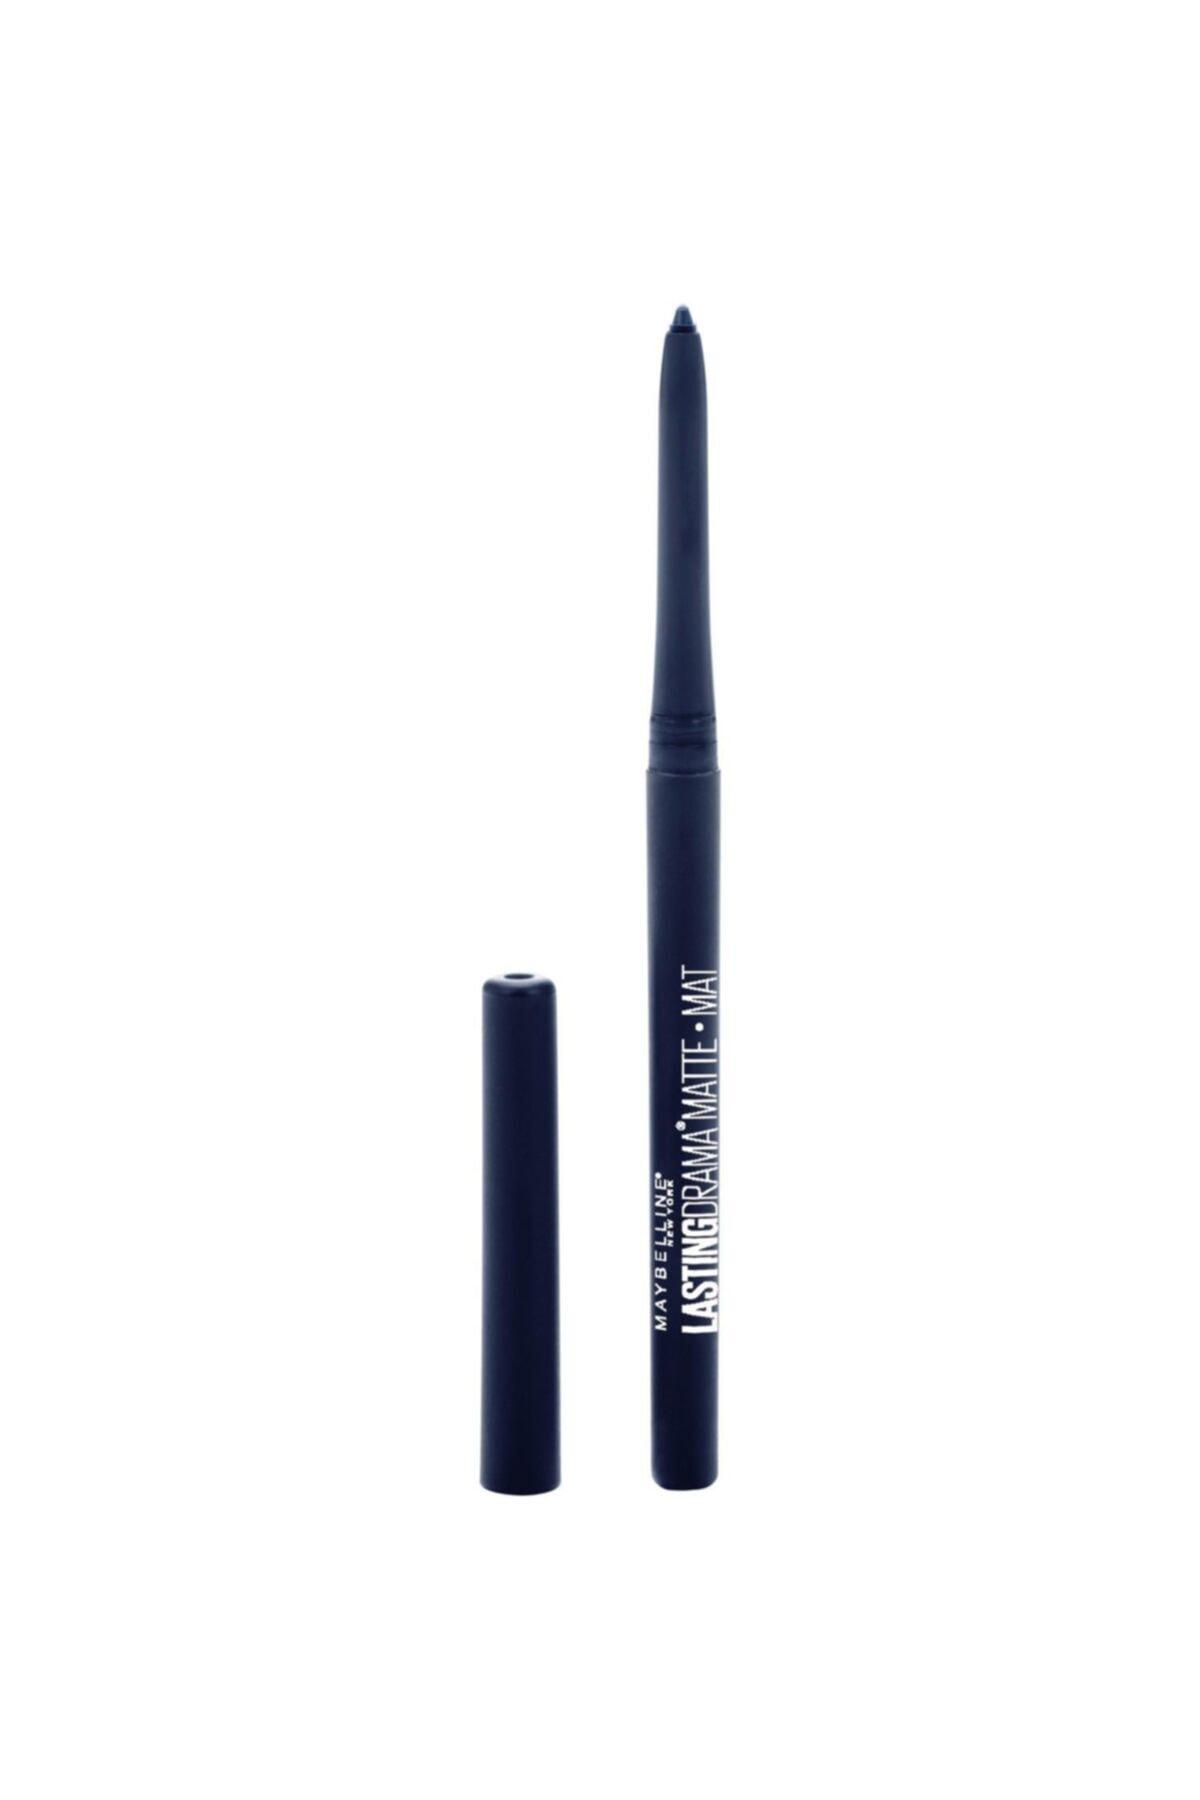 Maybelline New York Mat Eyeliner - Lasting Drama Carbon Matte 820 Lapis Navy 3600531509163 1